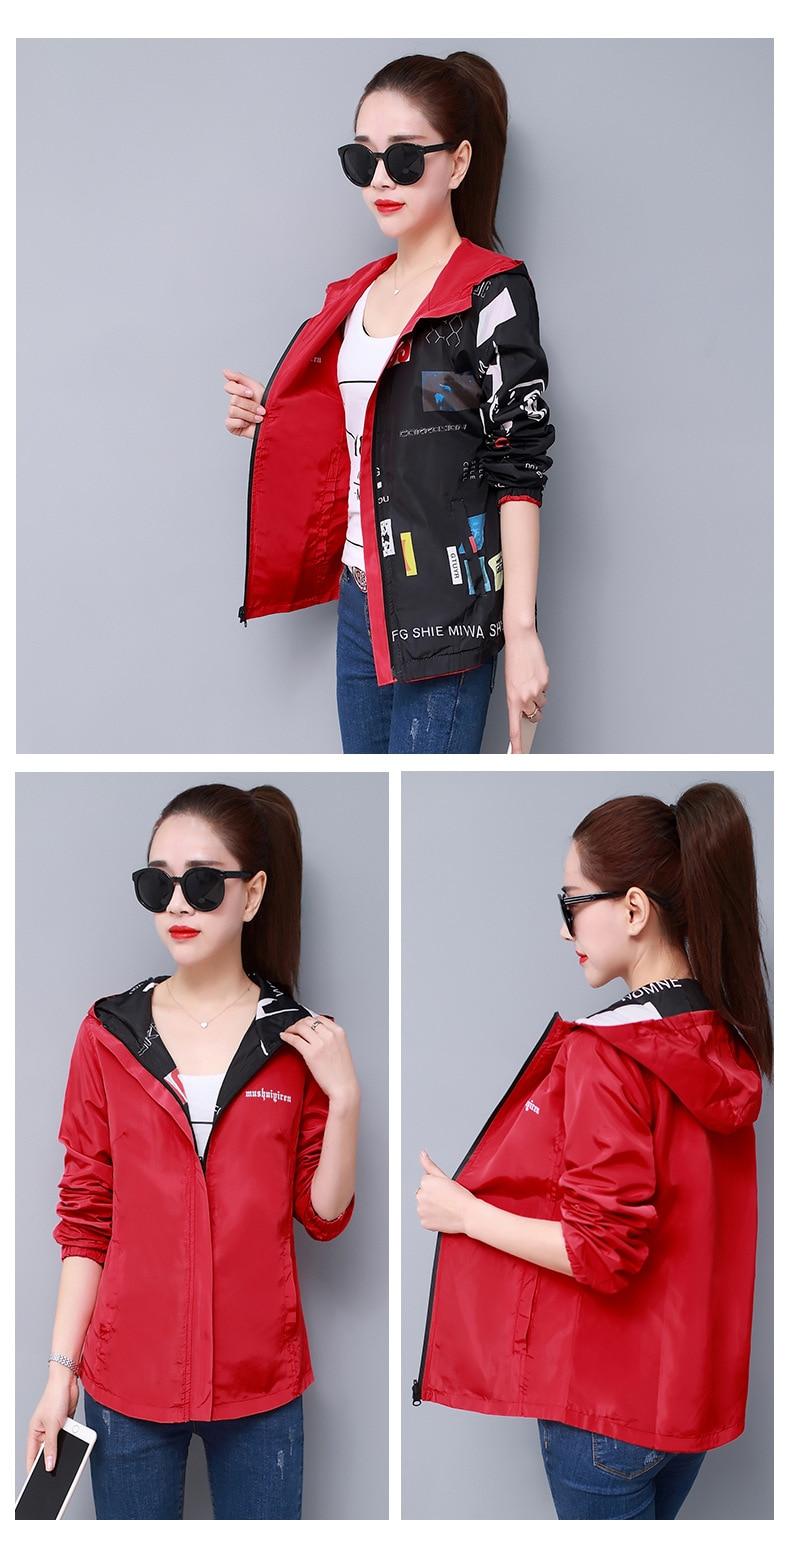 H28a942920cee4b9b9d36af336feb753aD Streetwear Hooded Printed jacket women And Causal windbreaker Basic Jackets 2019 New Reversible baseball Zippers jacket 4XL